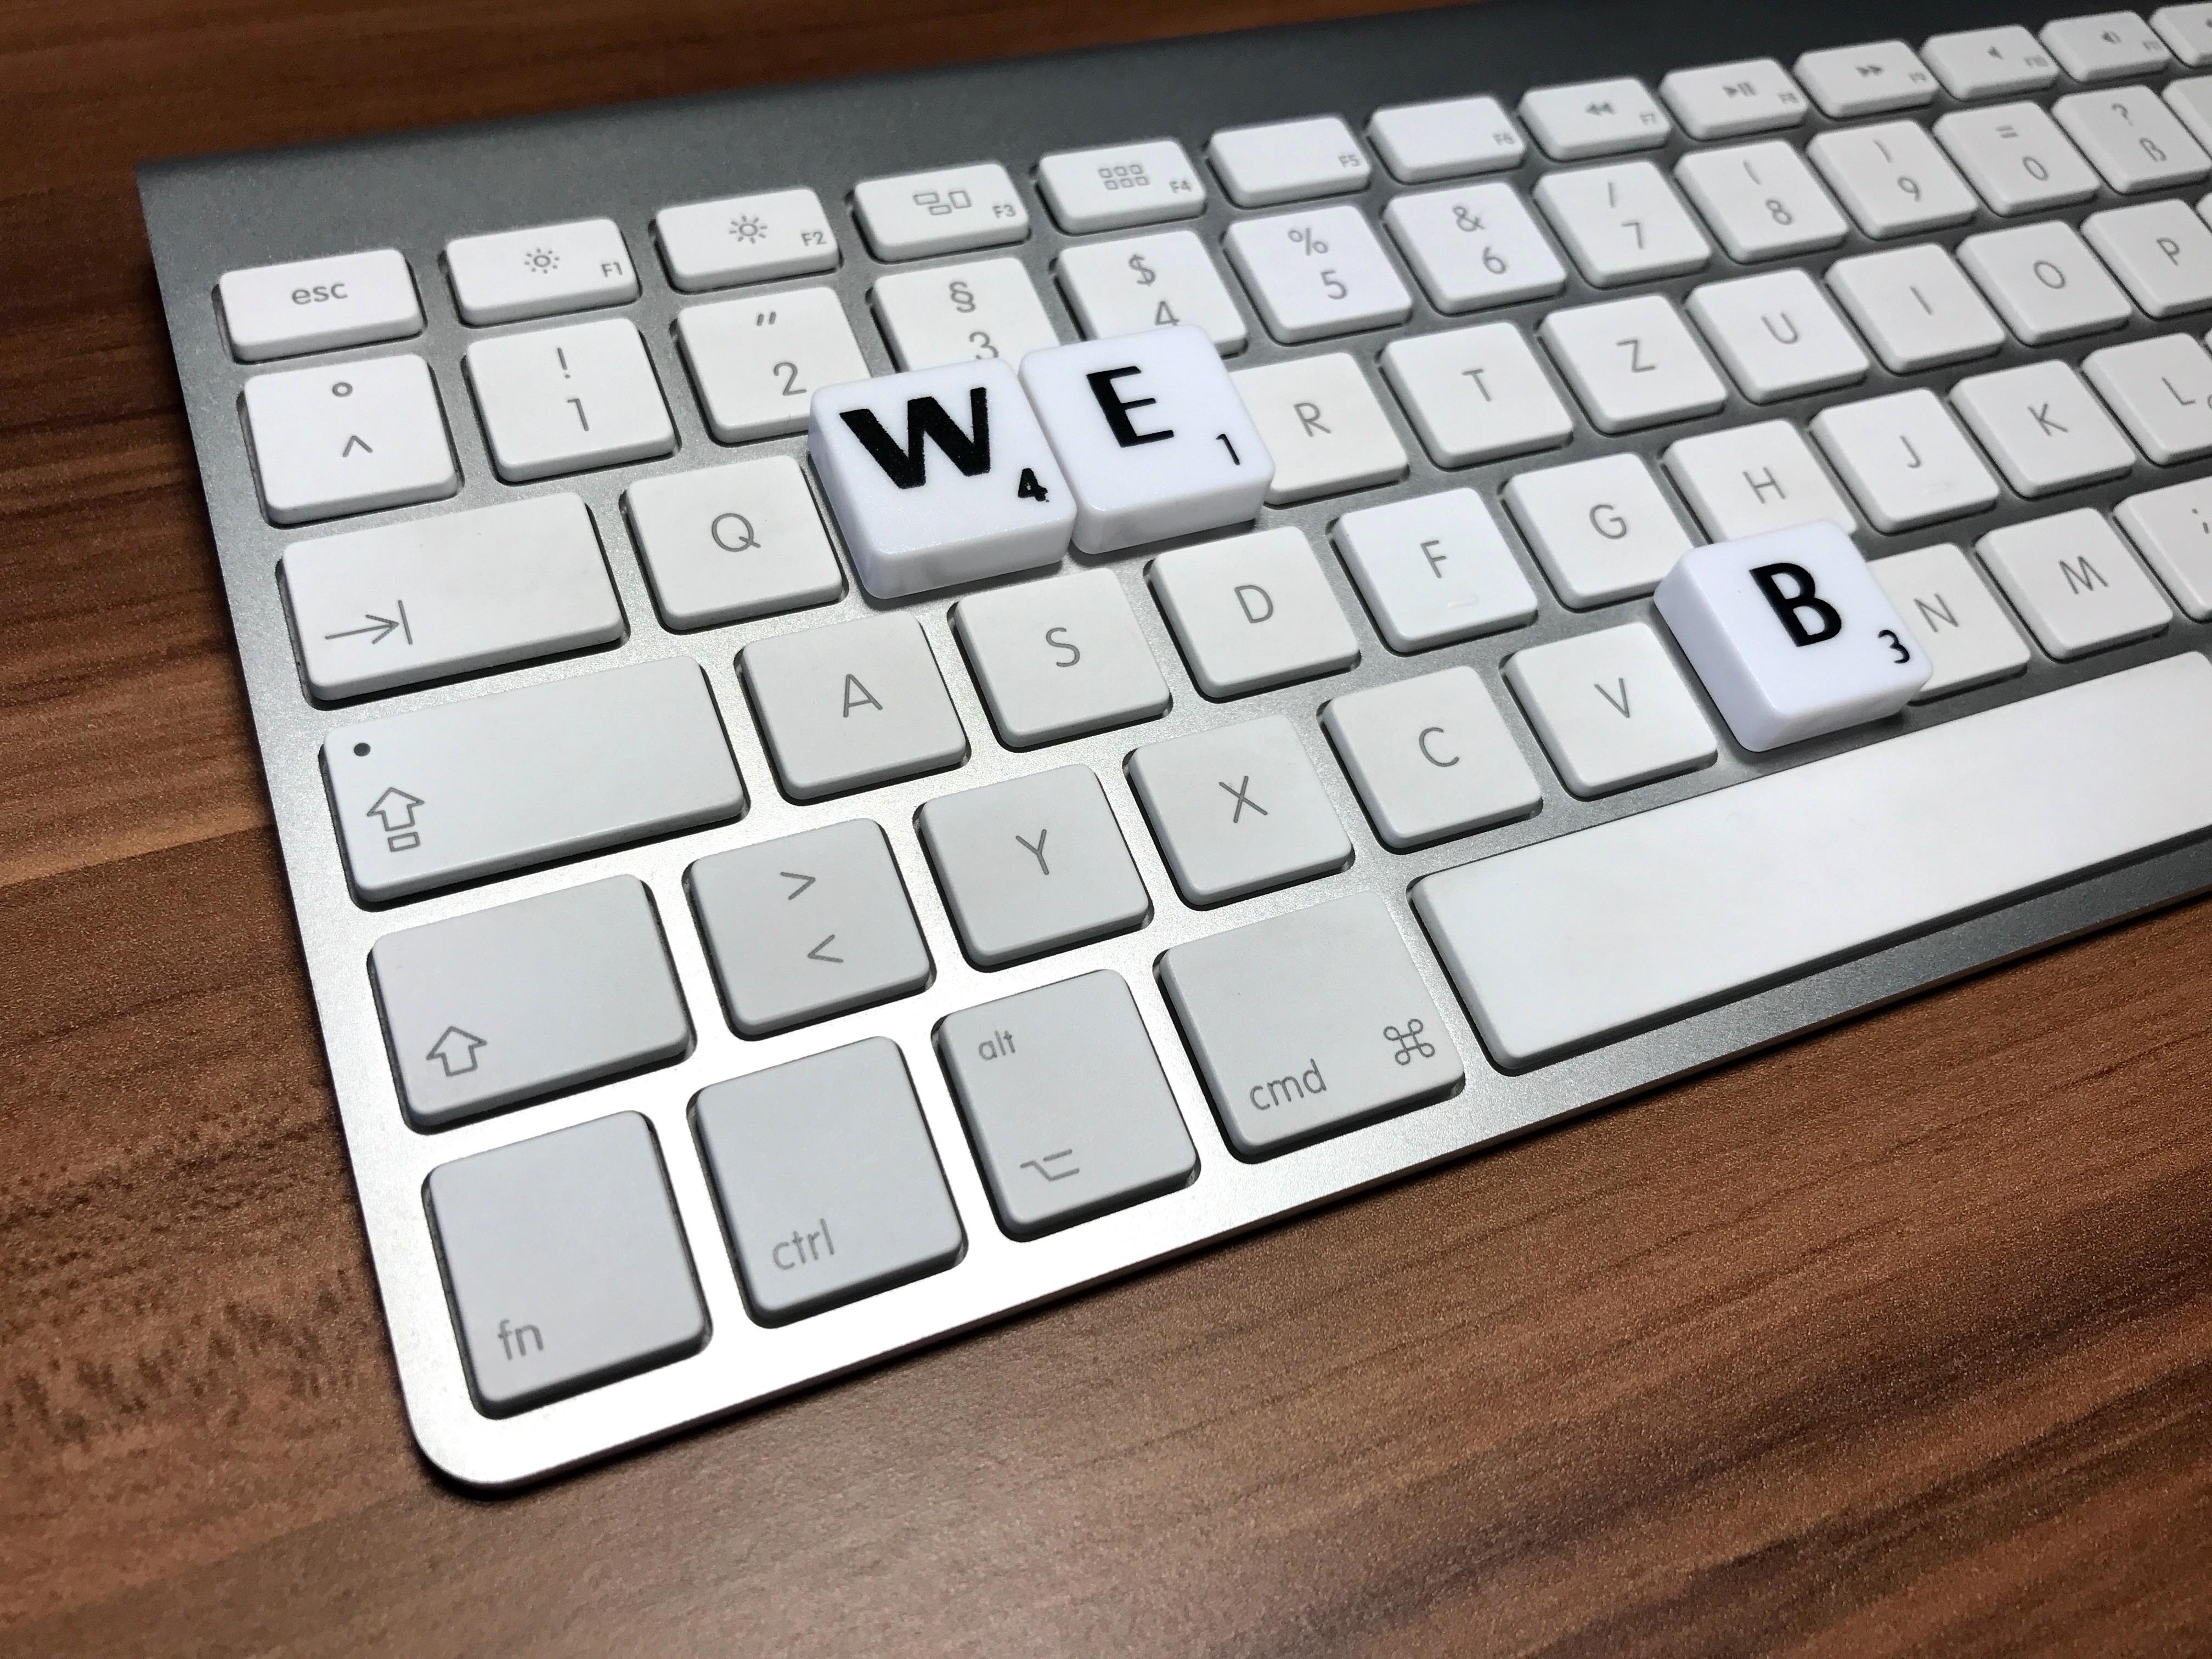 Computer Apple Keyboard Technology Web Internet Website Font Peripheral Www  Computer Keyboard Input Device Web Design